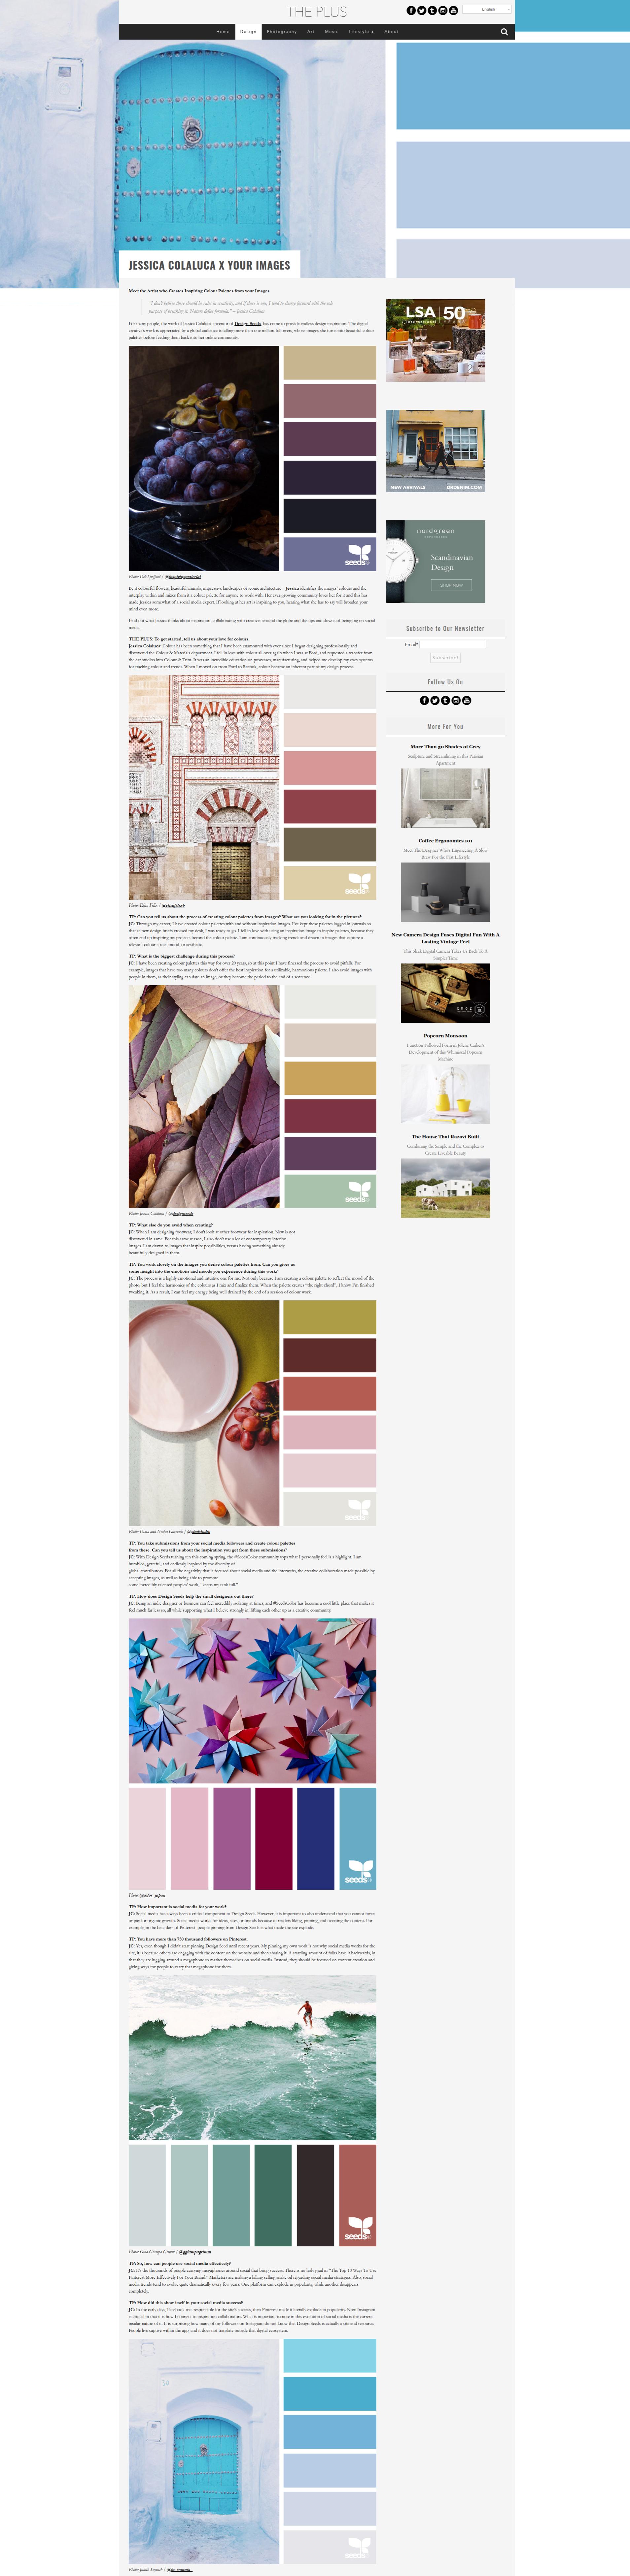 THE PLUS interview | Jessica Colaluca | Design Seeds